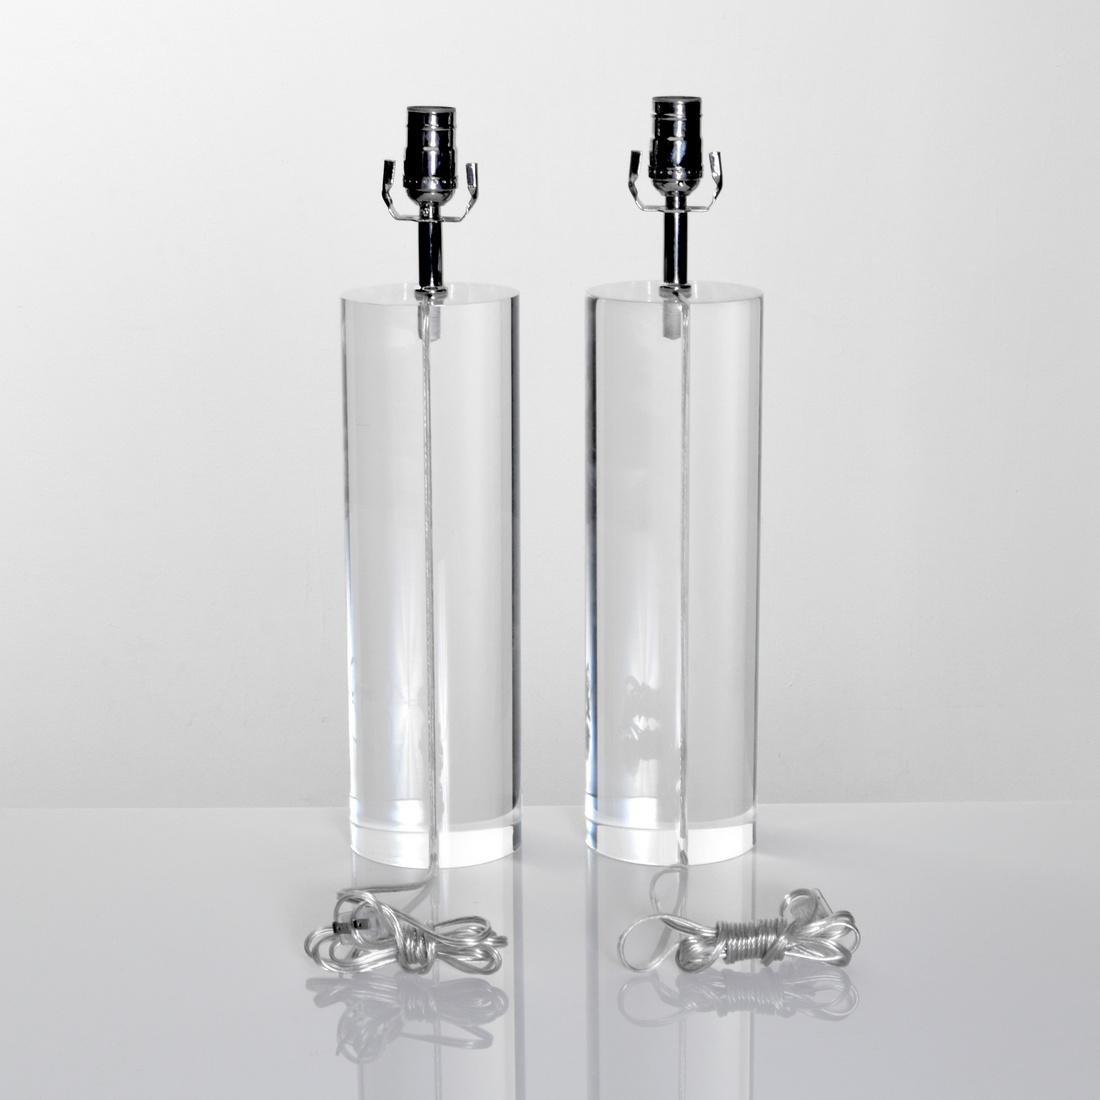 Pair of Lamps, Manner of Karl Springer - 3